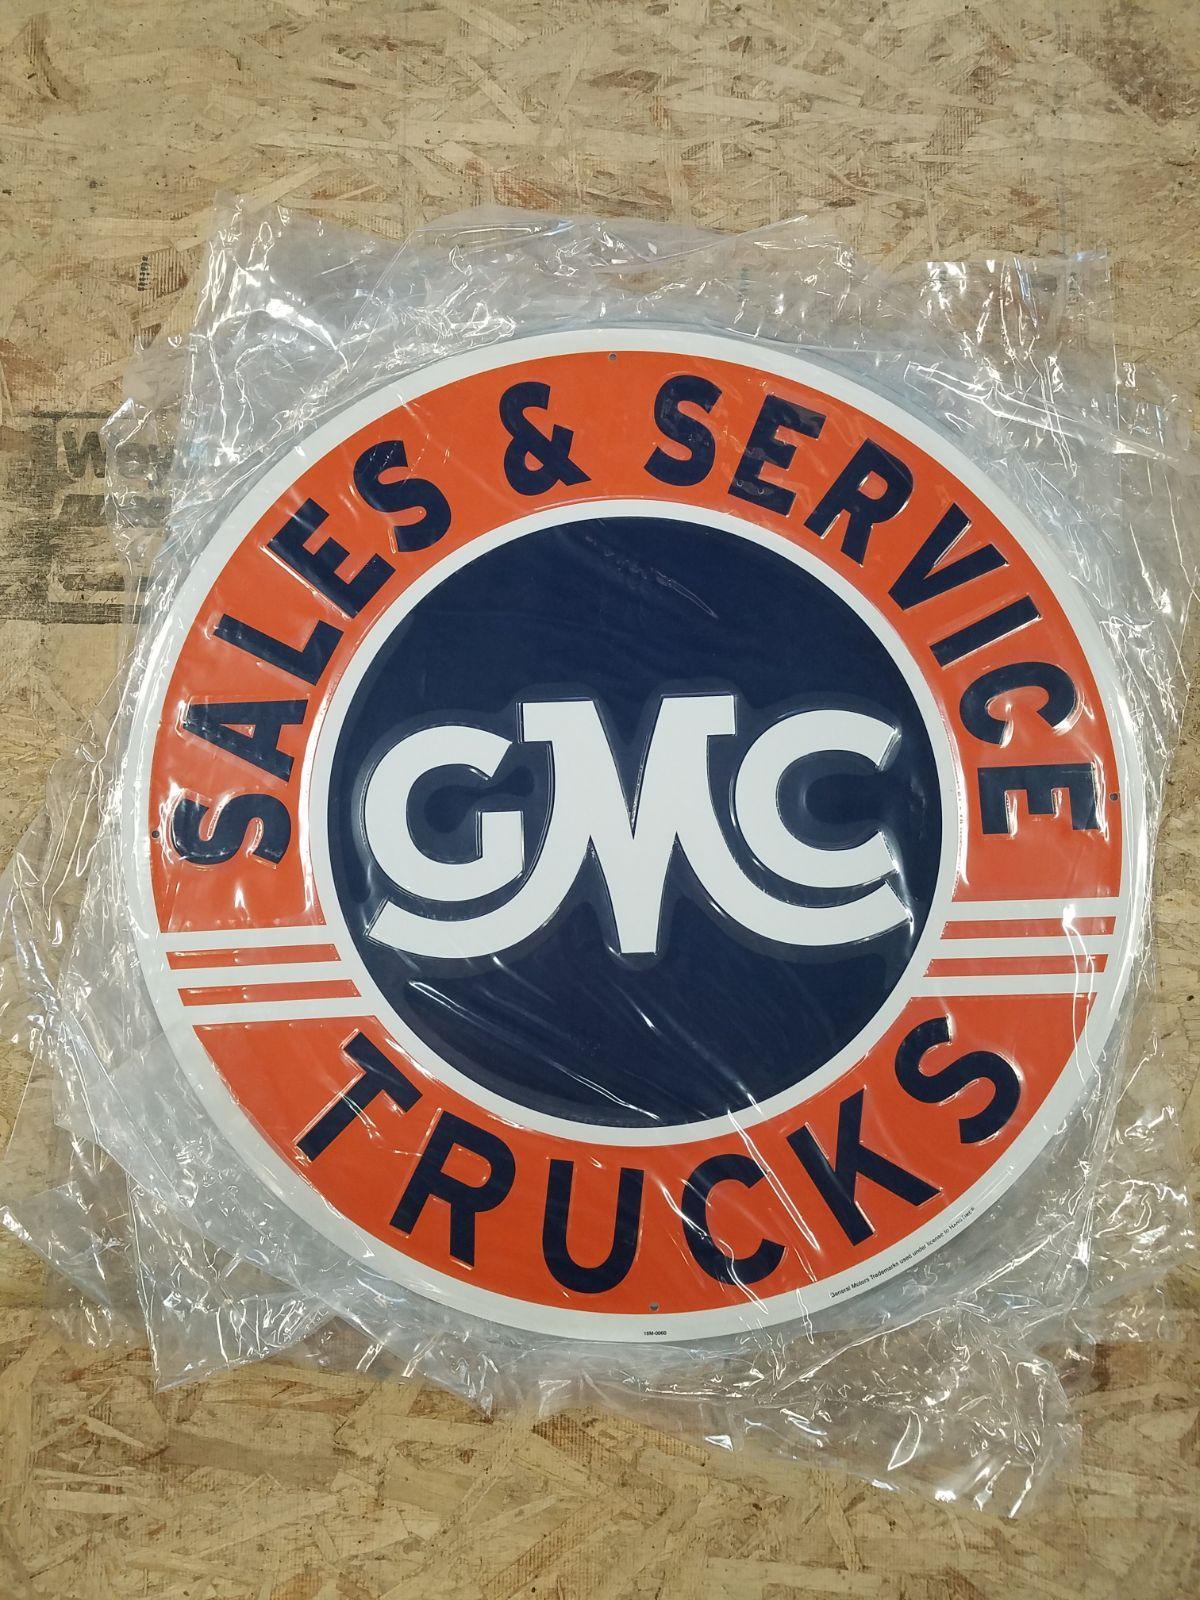 Huge Gmc Trucks Logo Embossed Metal Sign In 2020 Gmc Trucks